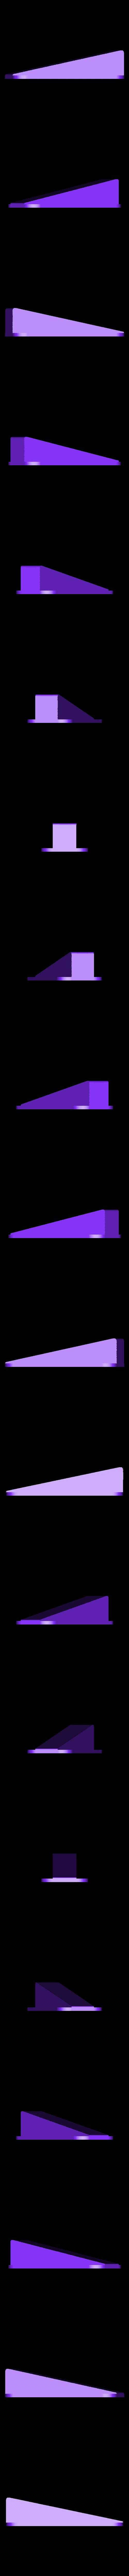 Doorstop.stl Download free STL file Simple Doorstop • 3D printable design, morrisblue